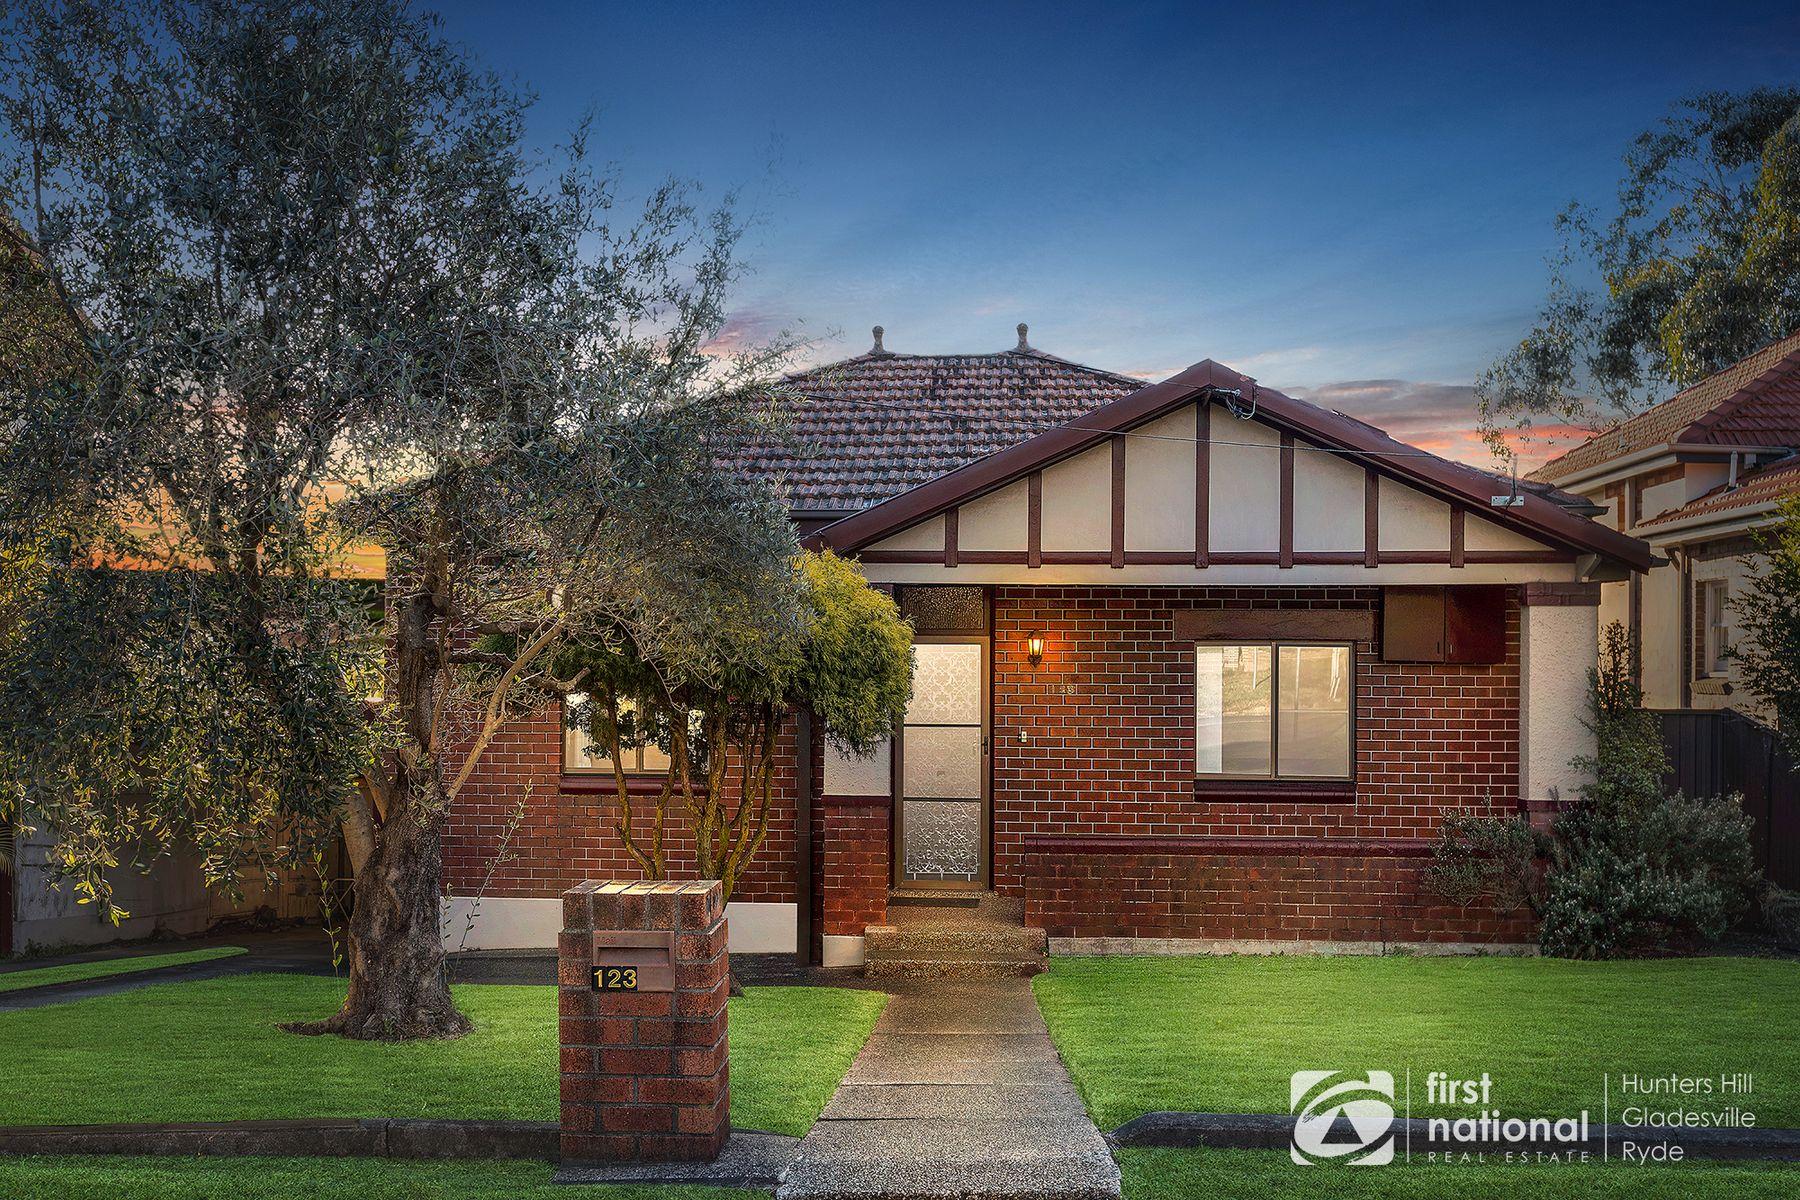 123 Charles Street, Putney, NSW 2112